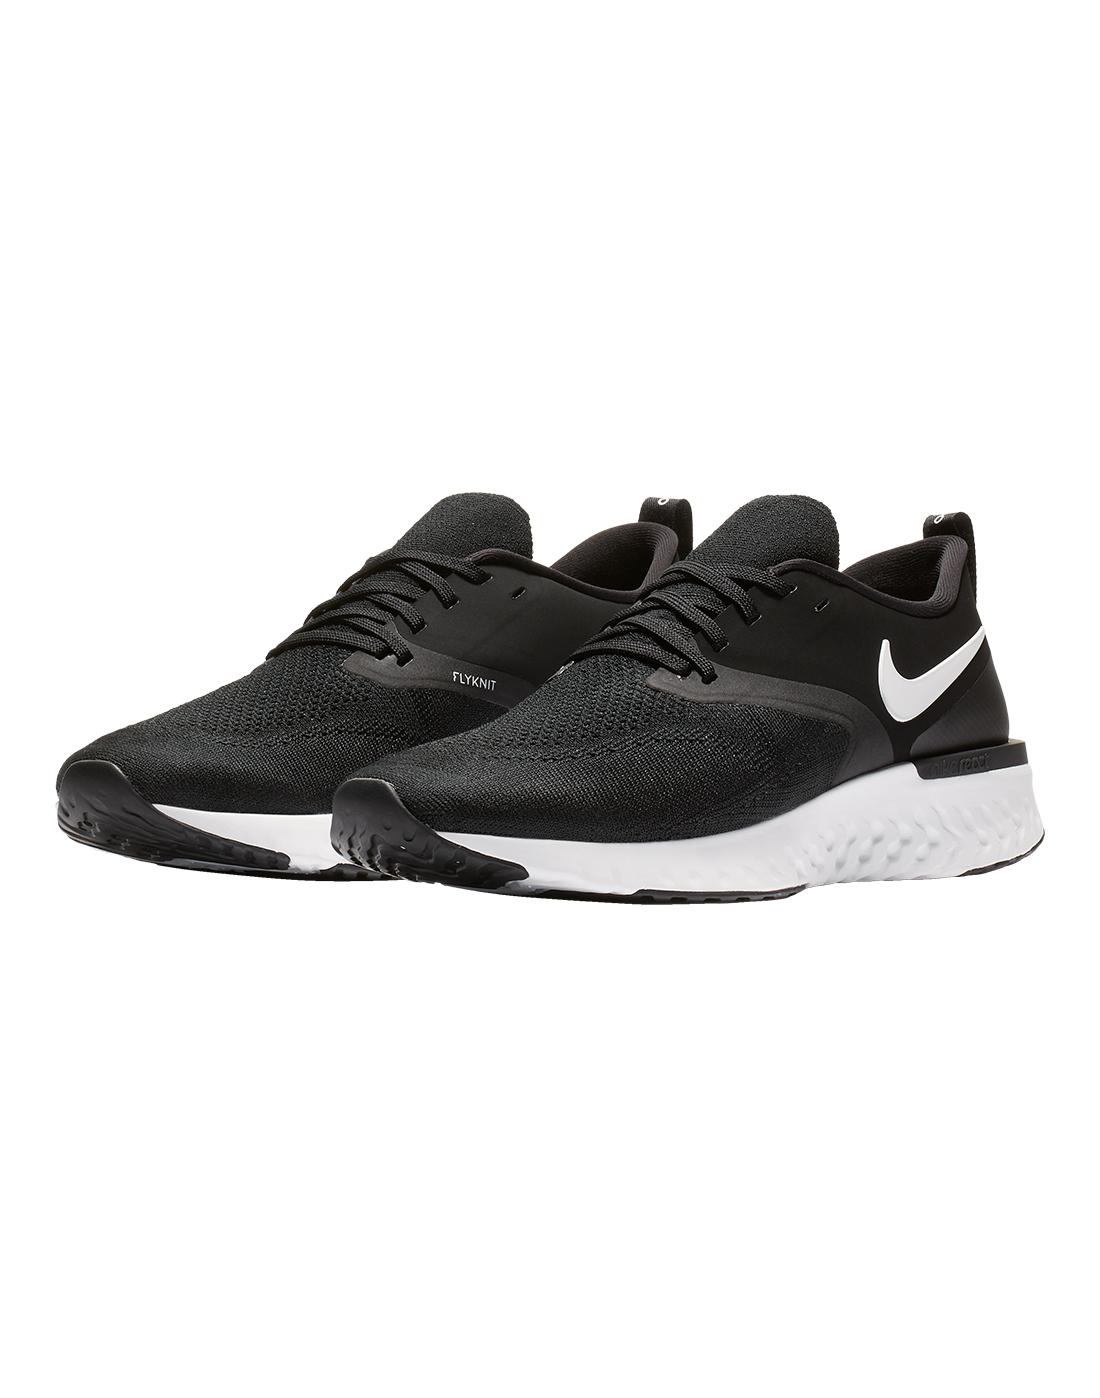 28b081240436 Men s Black   White Nike Odyssey React Flyknit